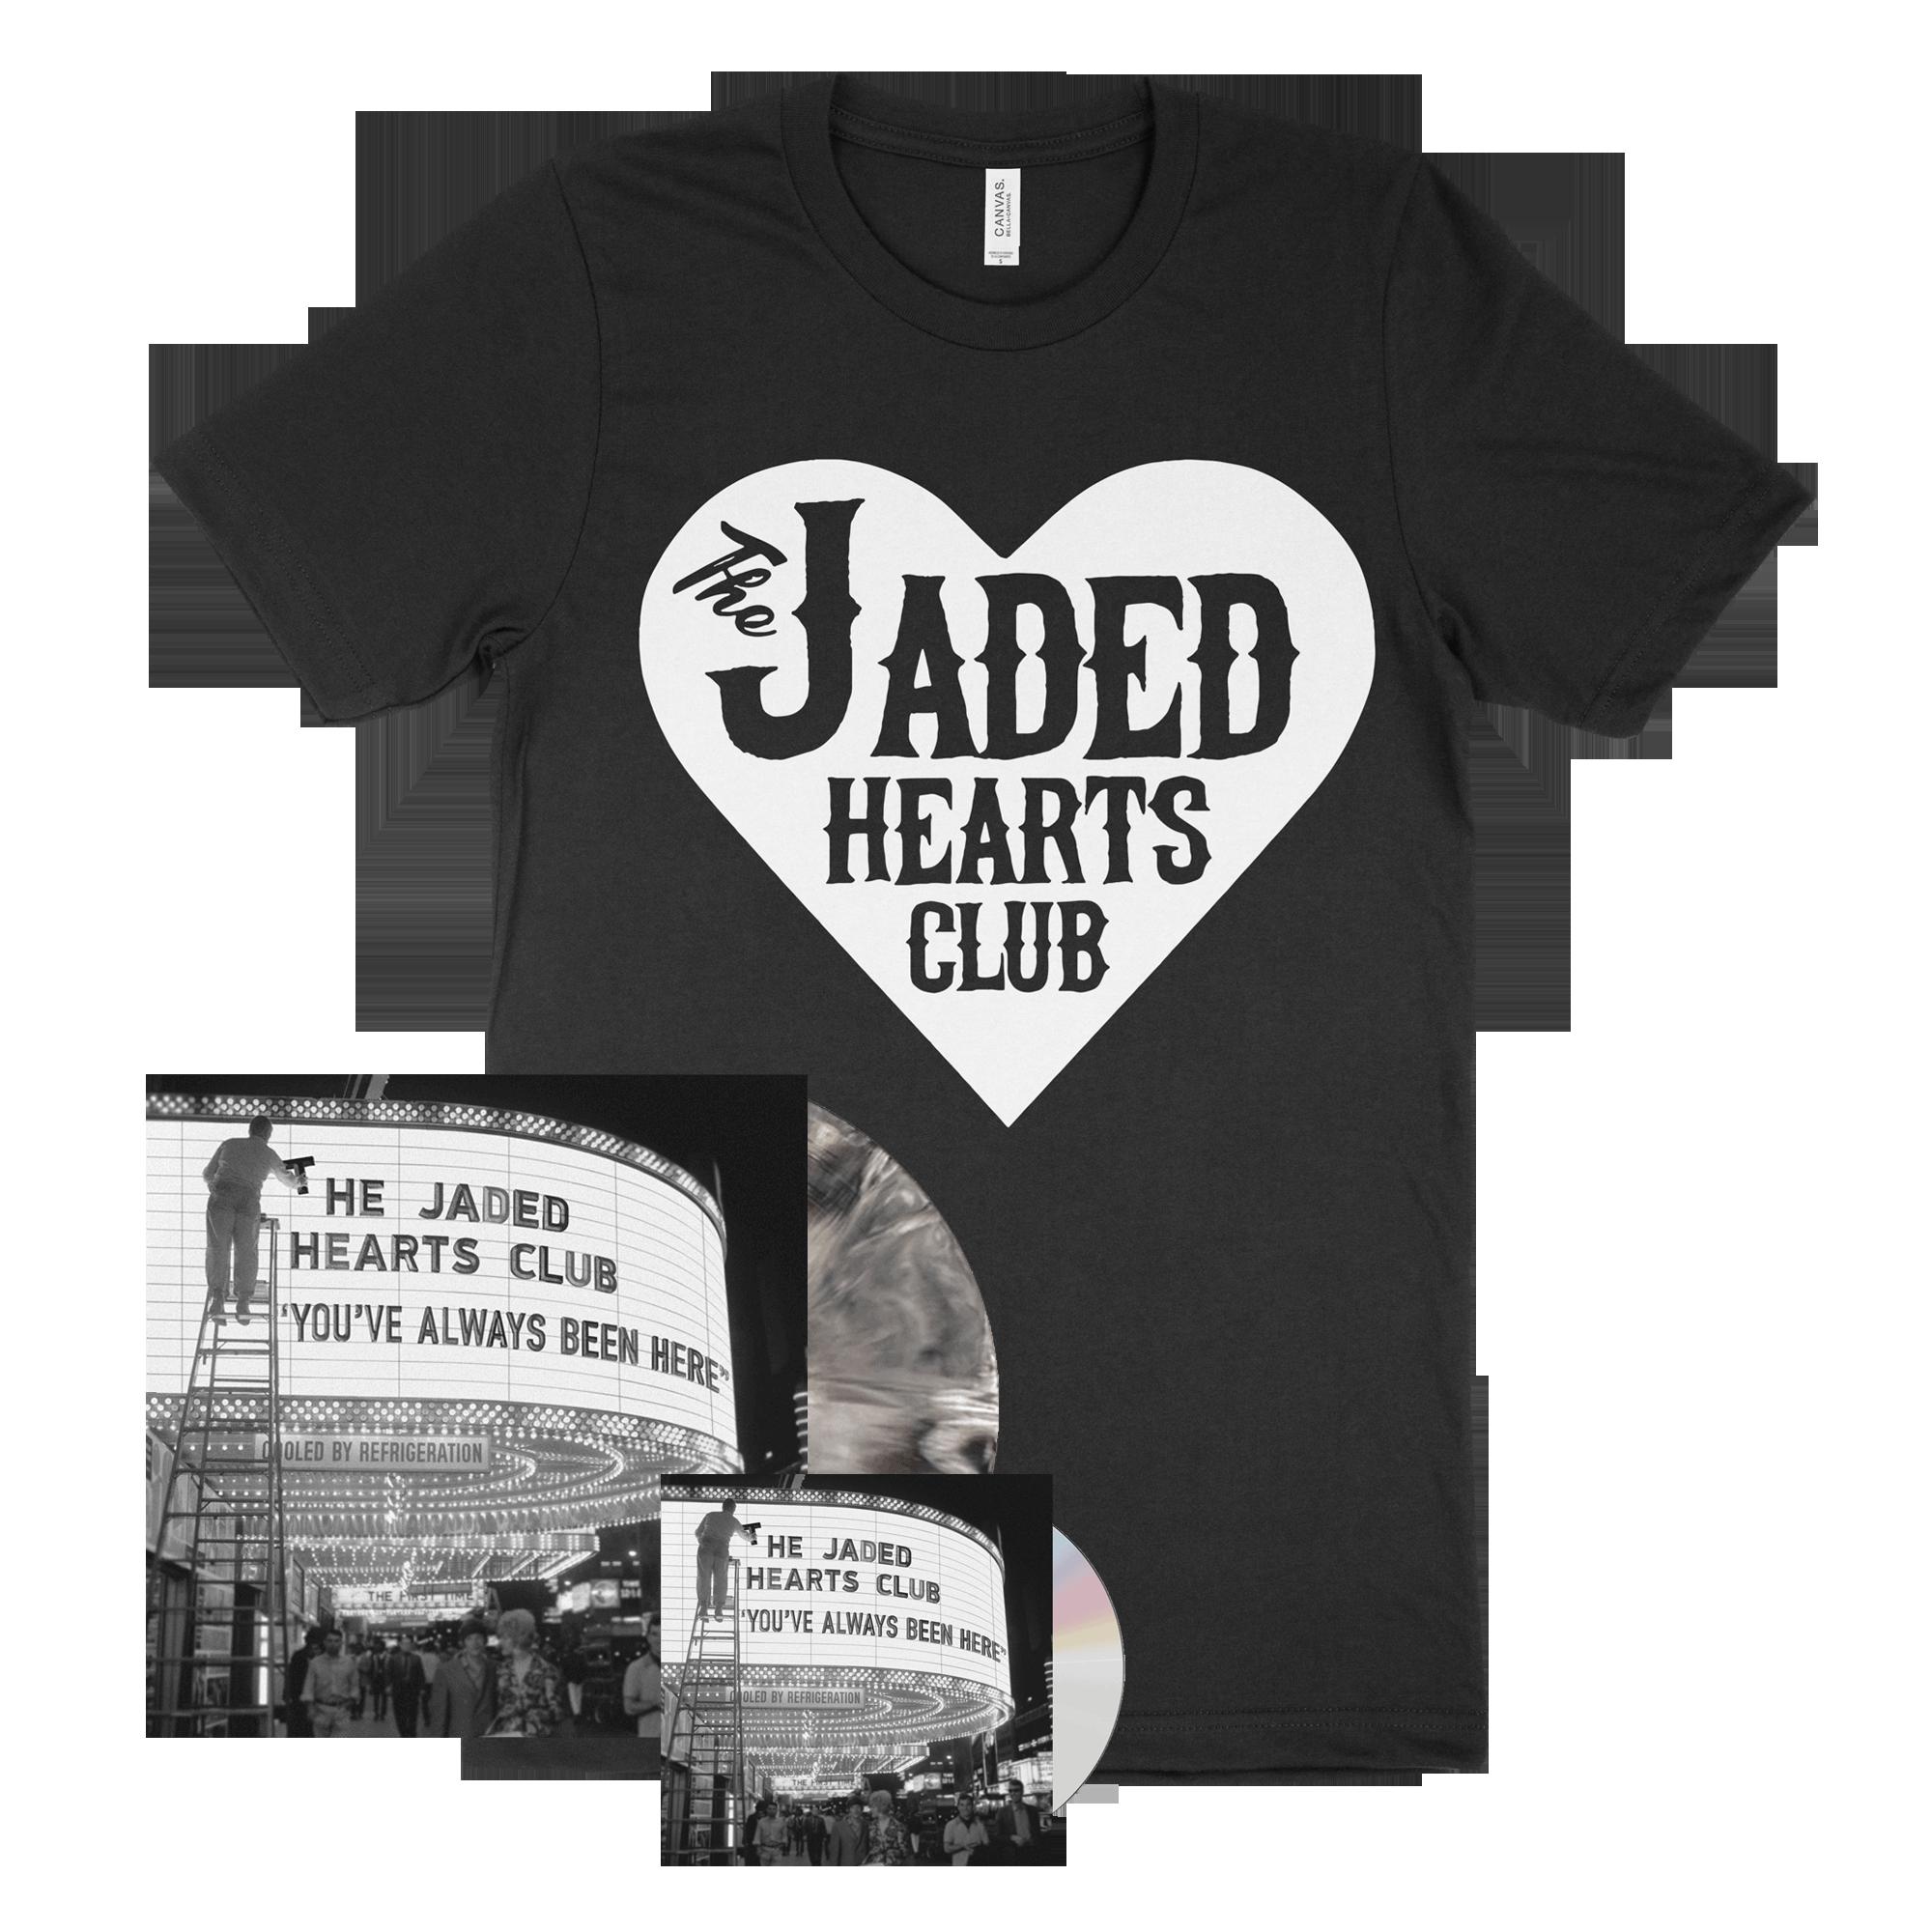 You've Always Been Here CD + Marbled Black & White Heavyweight Vinyl + Black Large Logo T-Shirt